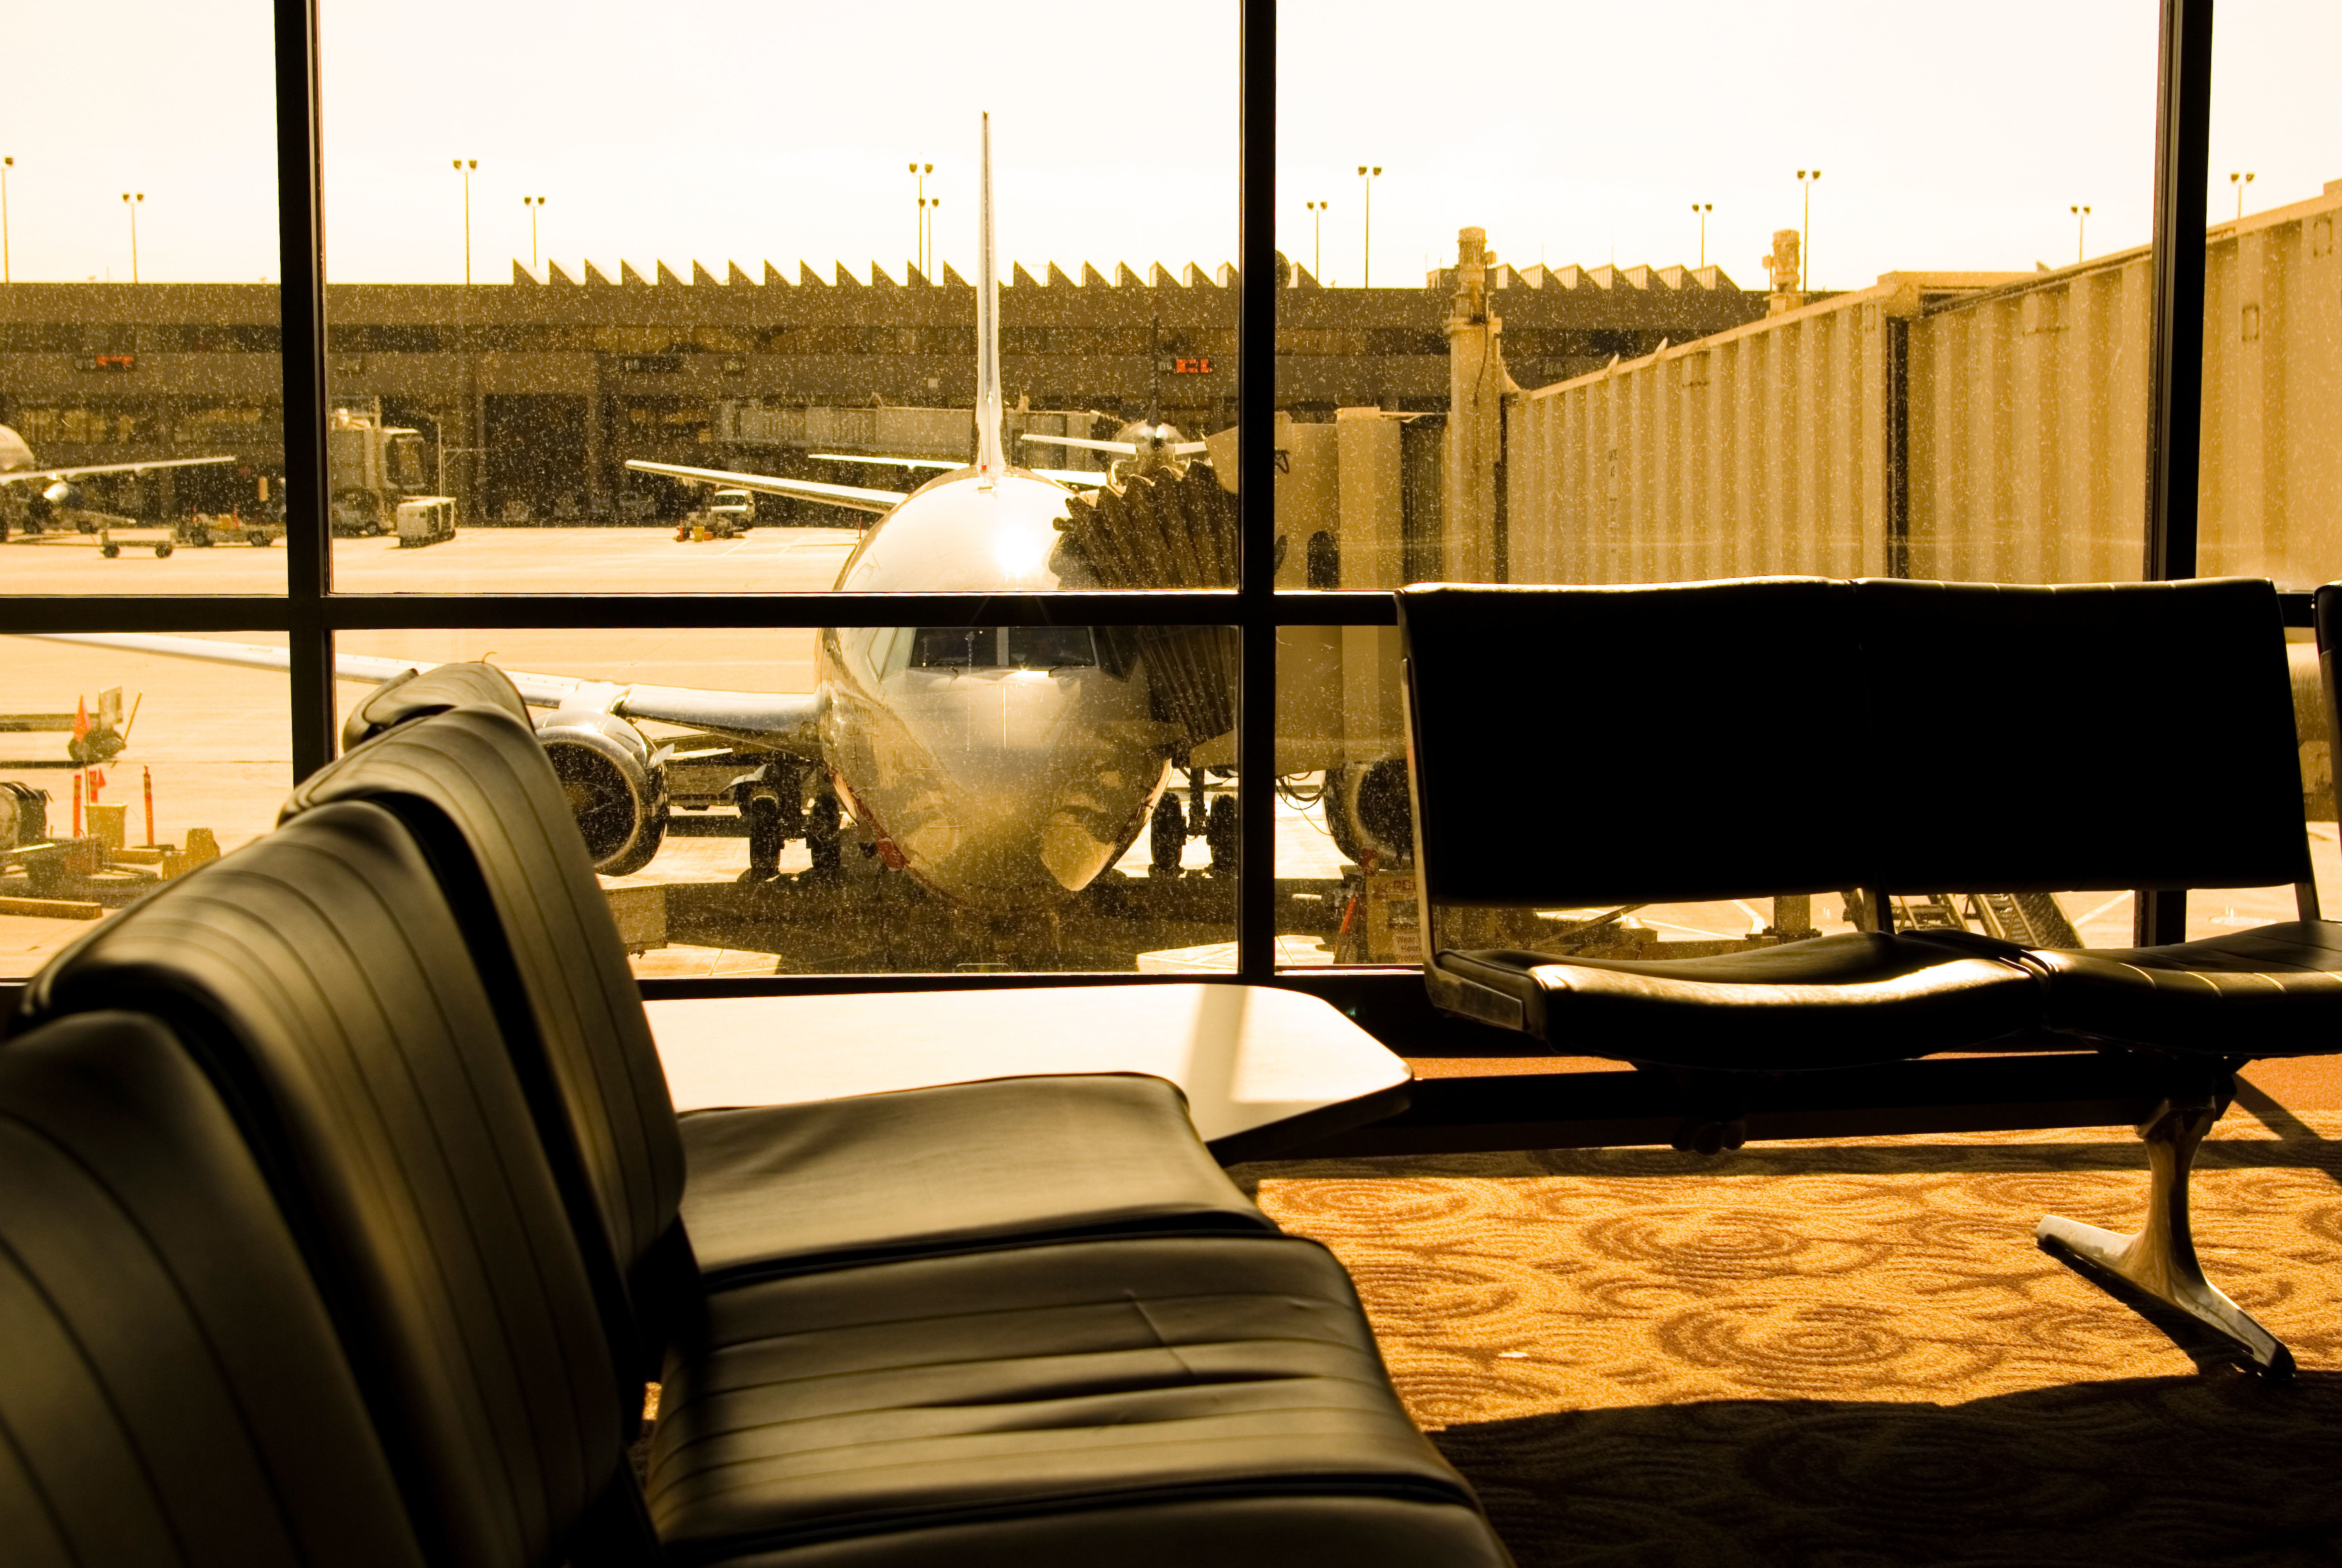 philadelphia airport usa departure gate internal US air travel plane docking seating empty day airplane travel flight aviation